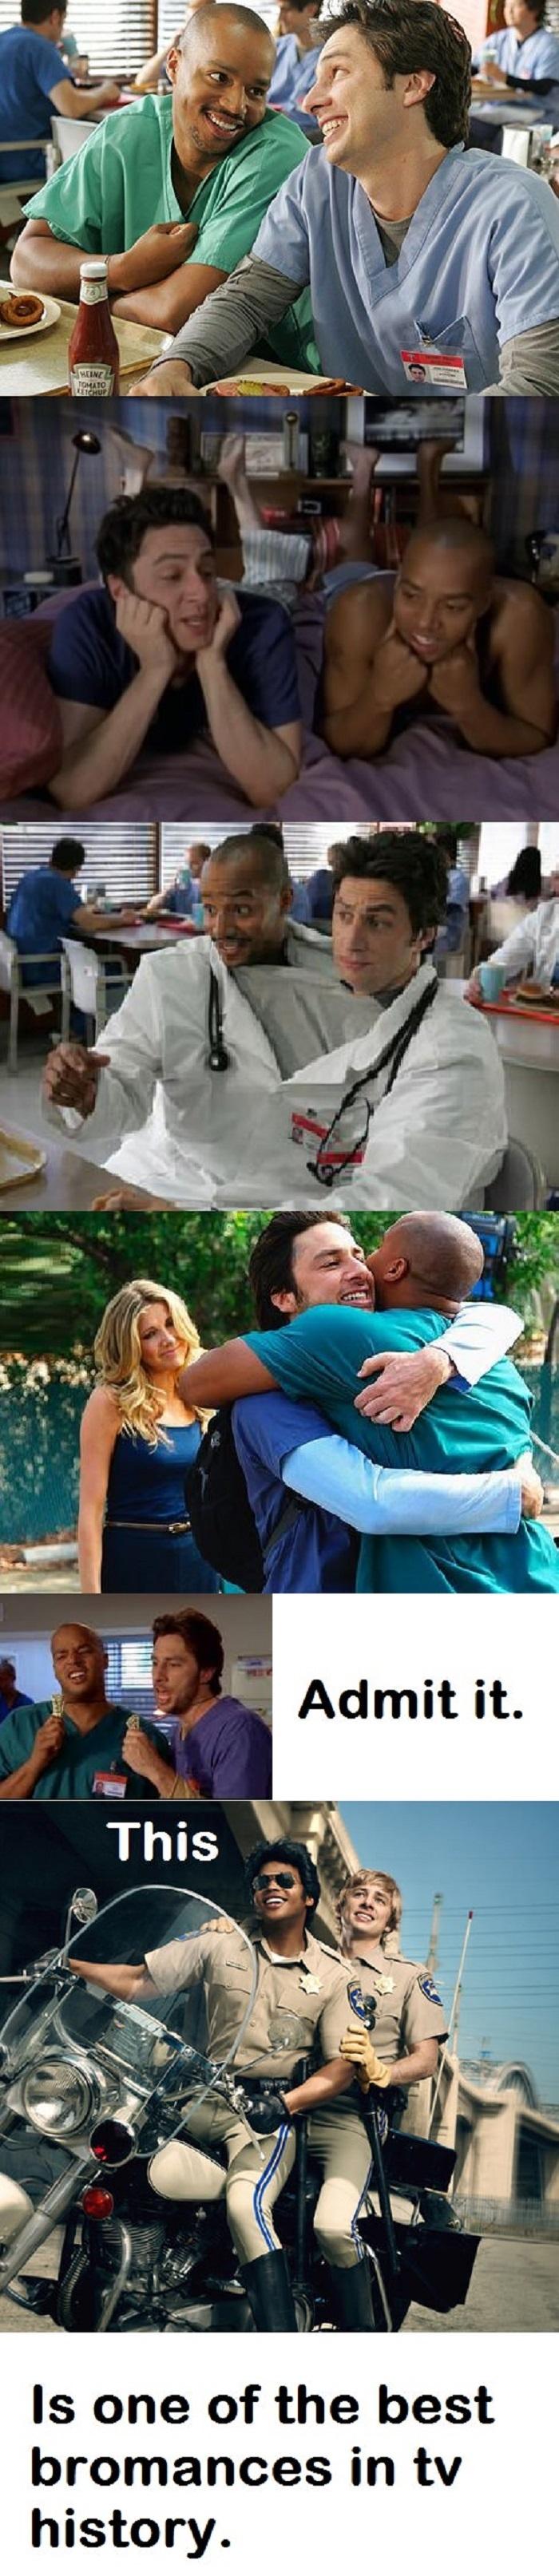 Best bromance ever Scrubs tv shows, Scrubs tv, Scrubs funny